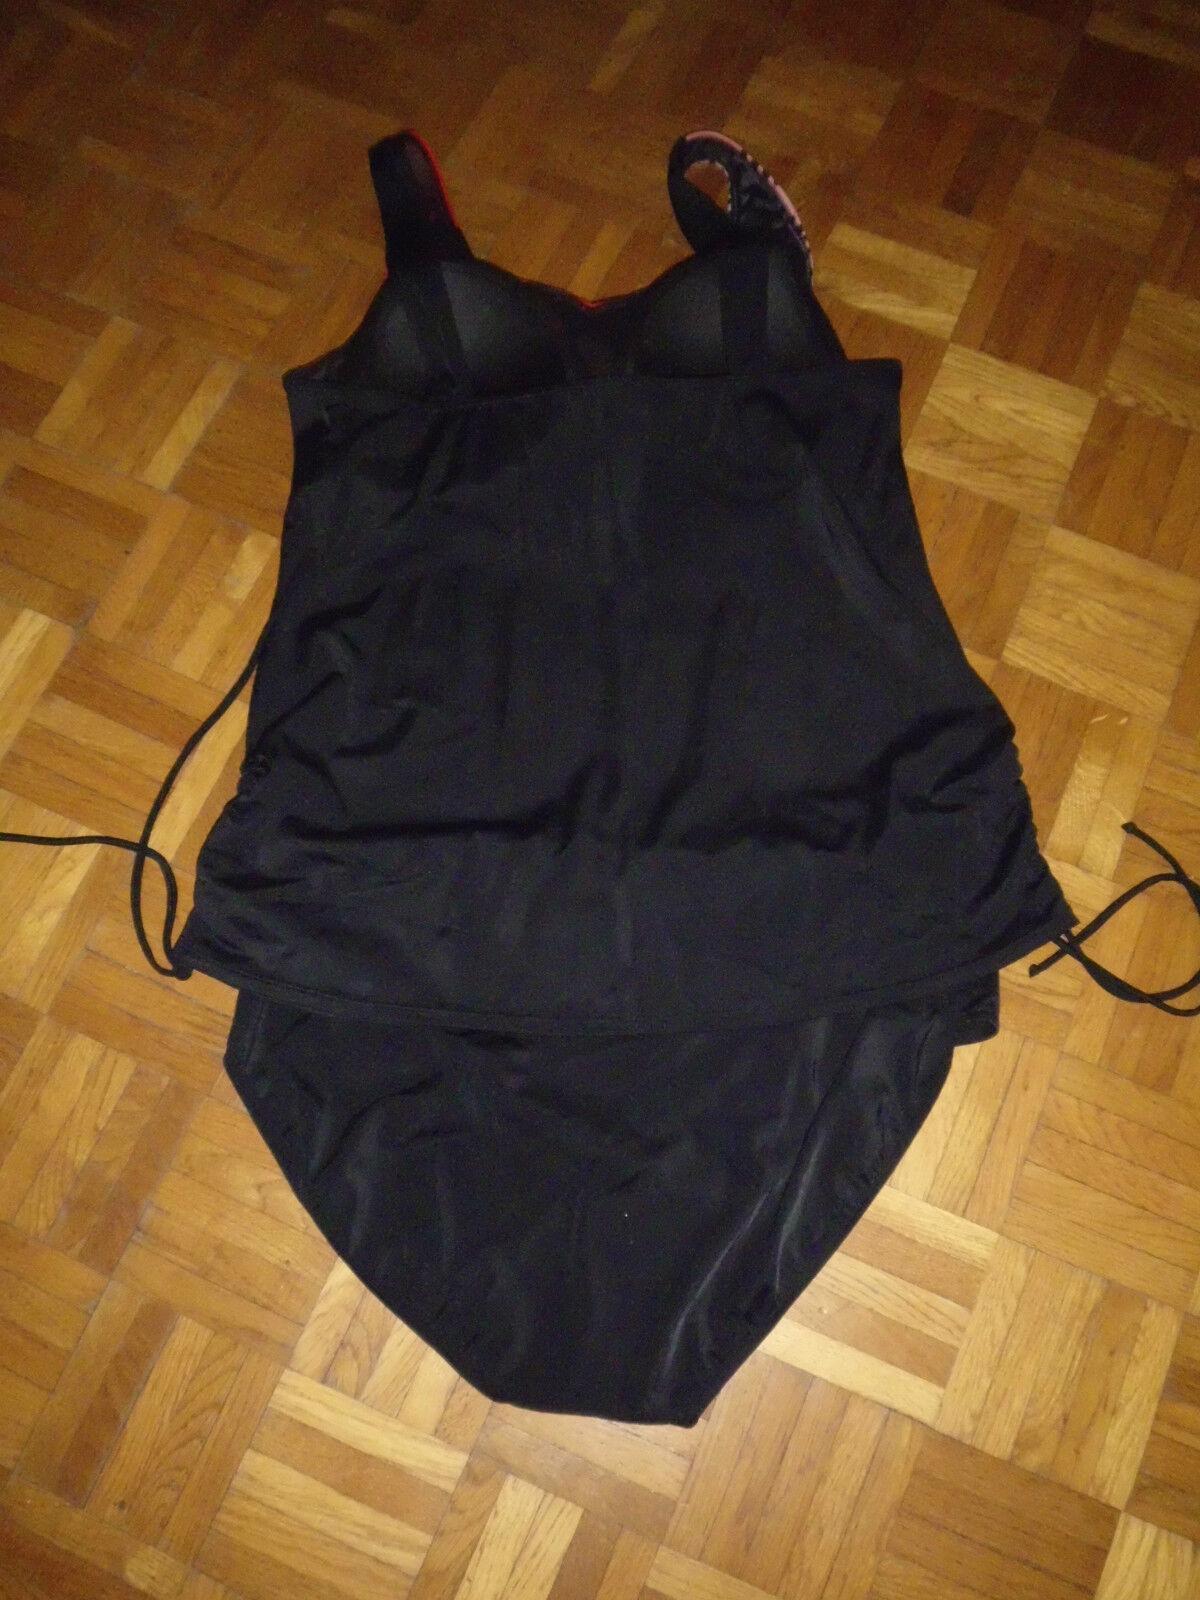 Tankini   Badekleid   Badeanzug NEU NEU NEU 54 B BH unterfüttert schwarz rot oder blau | Moderne Technologie  | Heißer Verkauf  596452